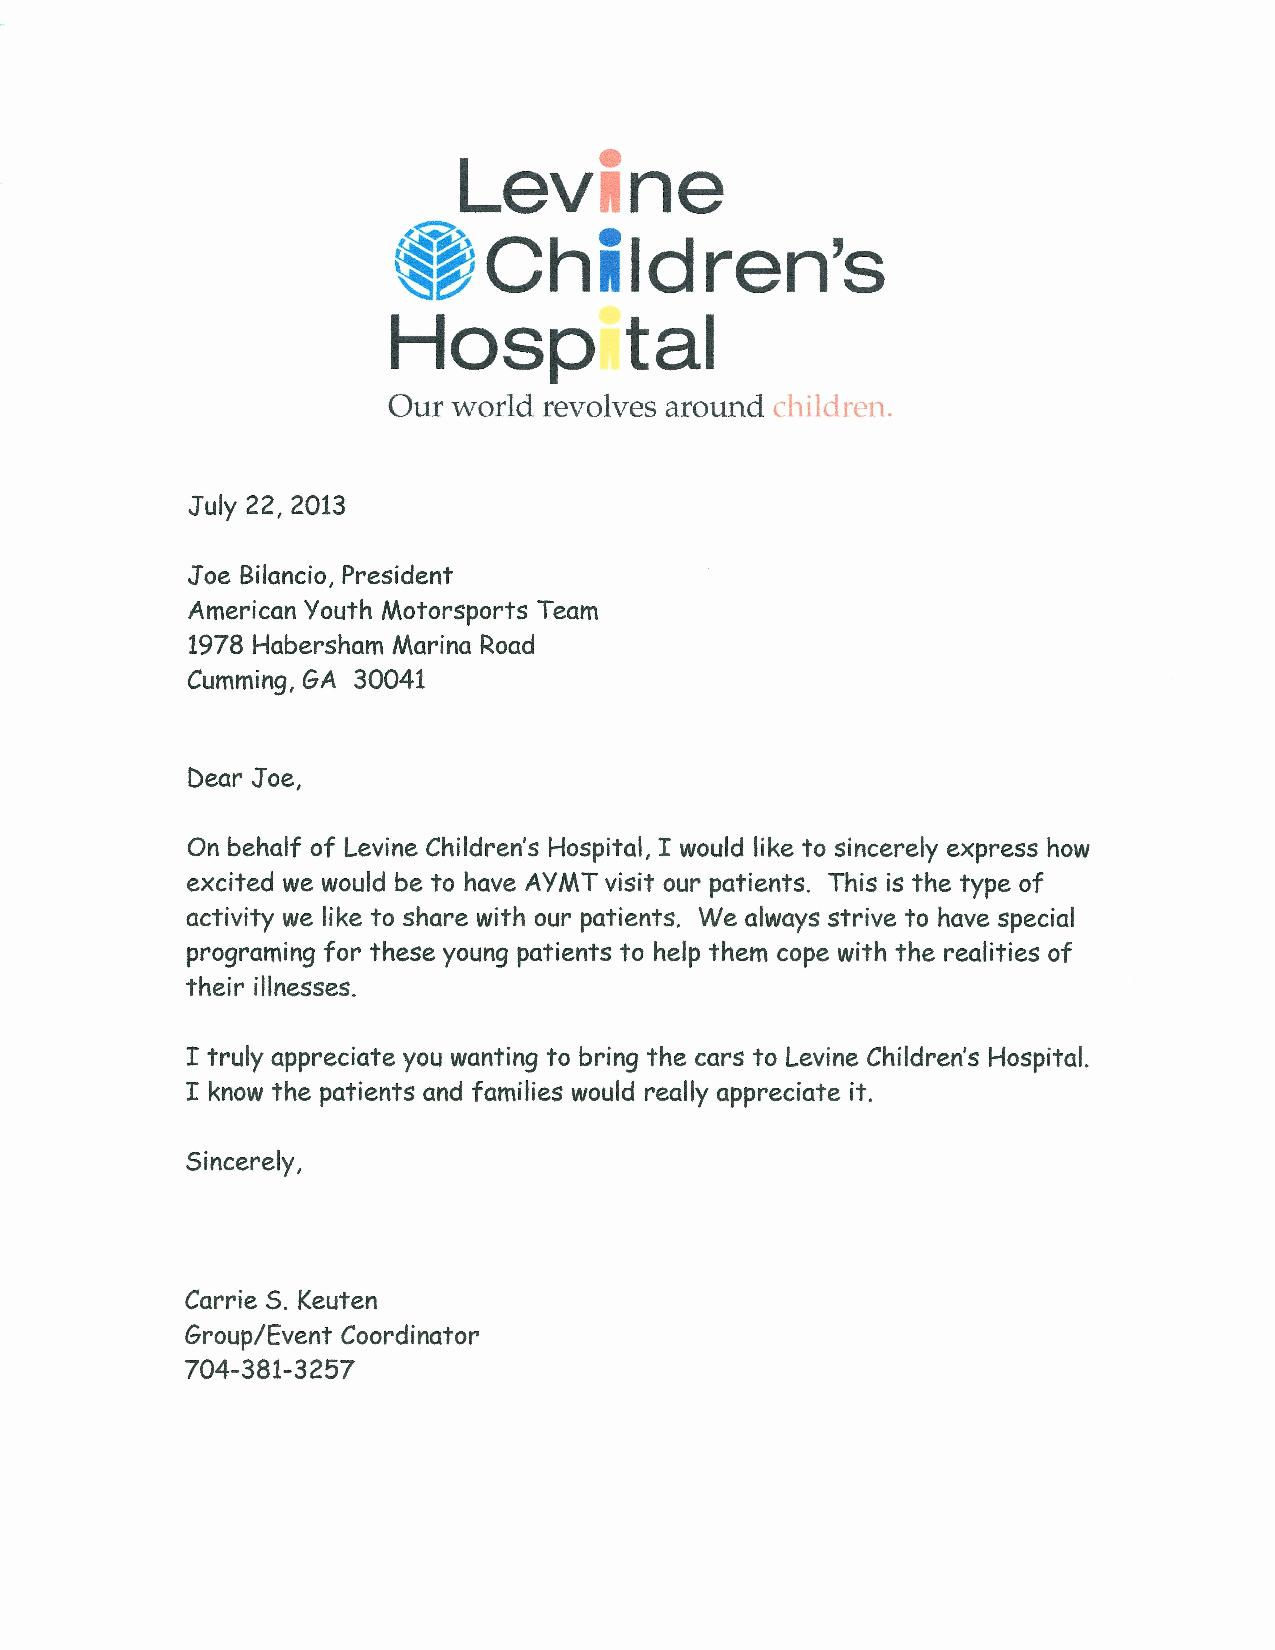 levine-childrens-hospital-invitation-letter-2013